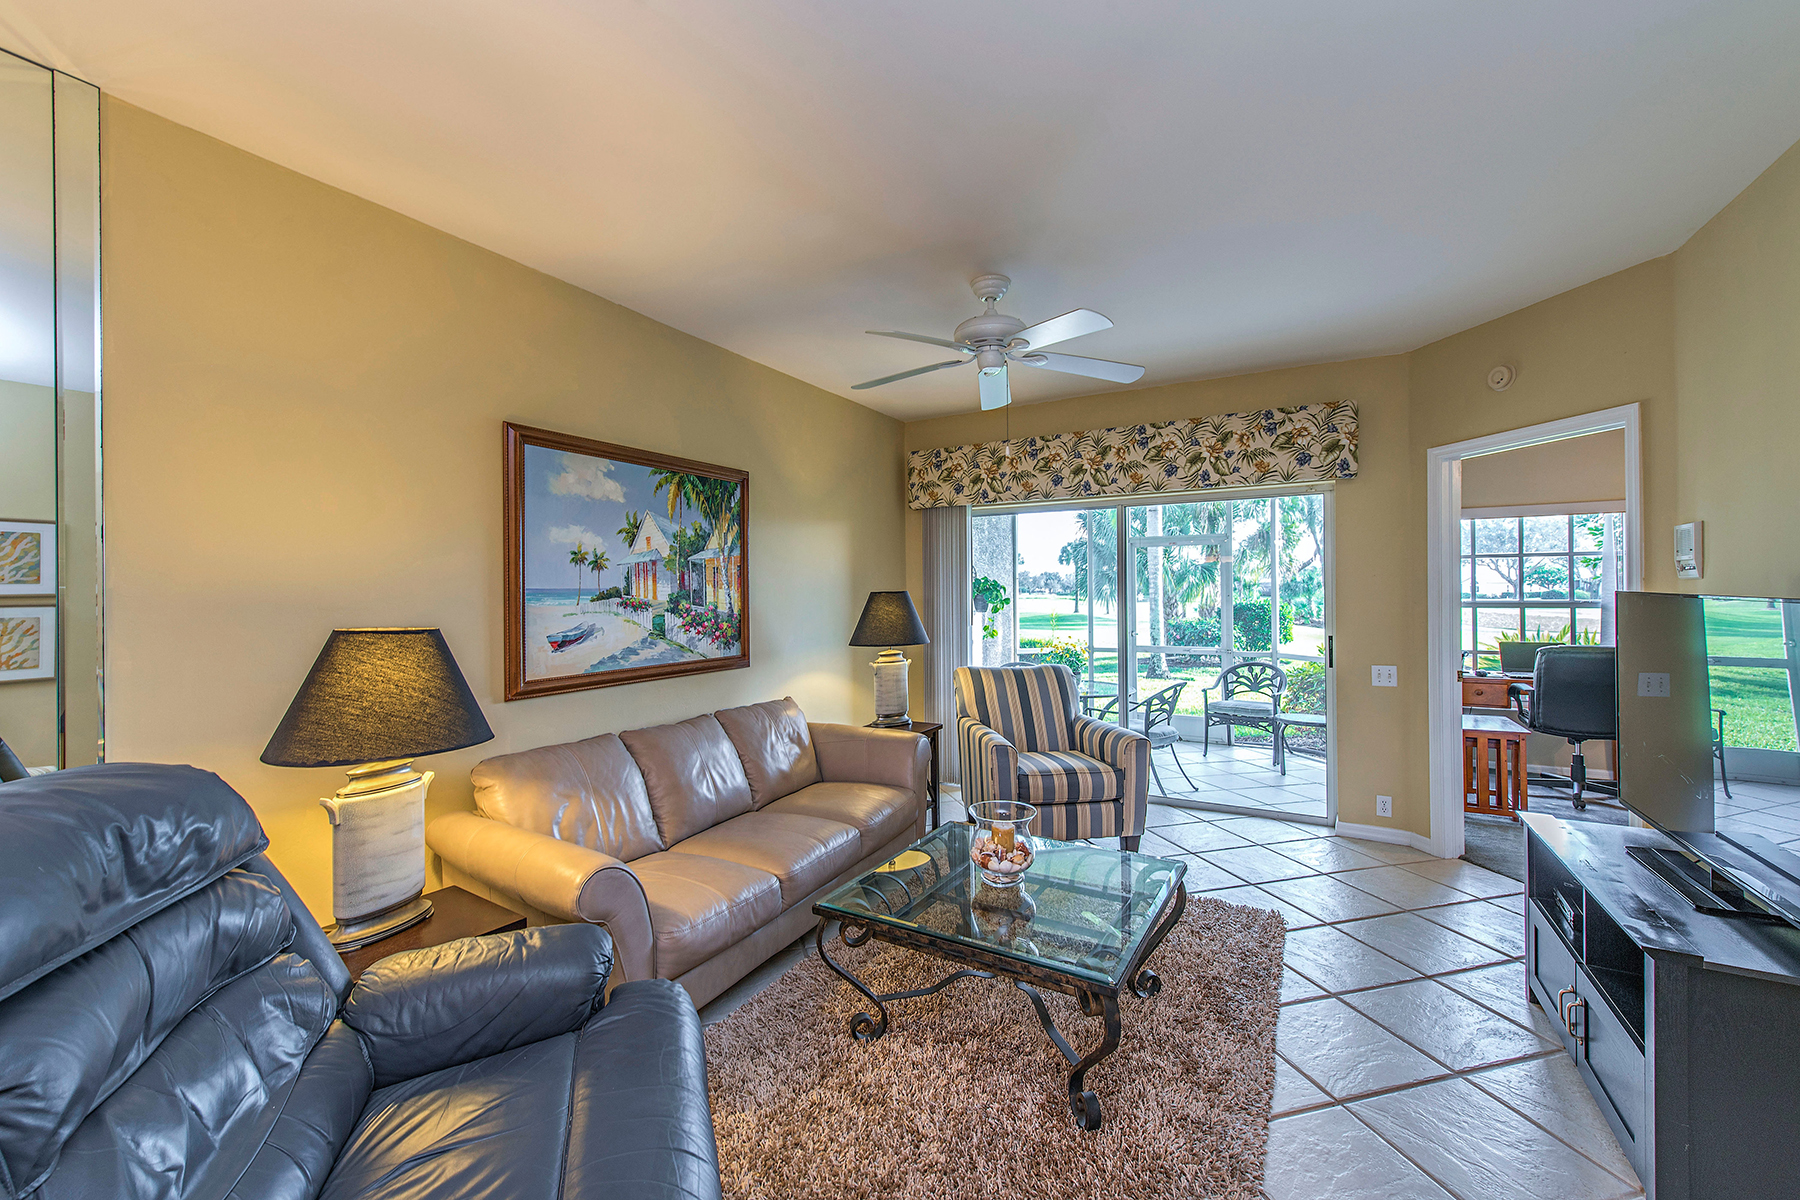 Condomínio para Venda às WORTHINGTON 13631 Worthington Way 1702 Bonita Springs, Florida, 34135 Estados Unidos